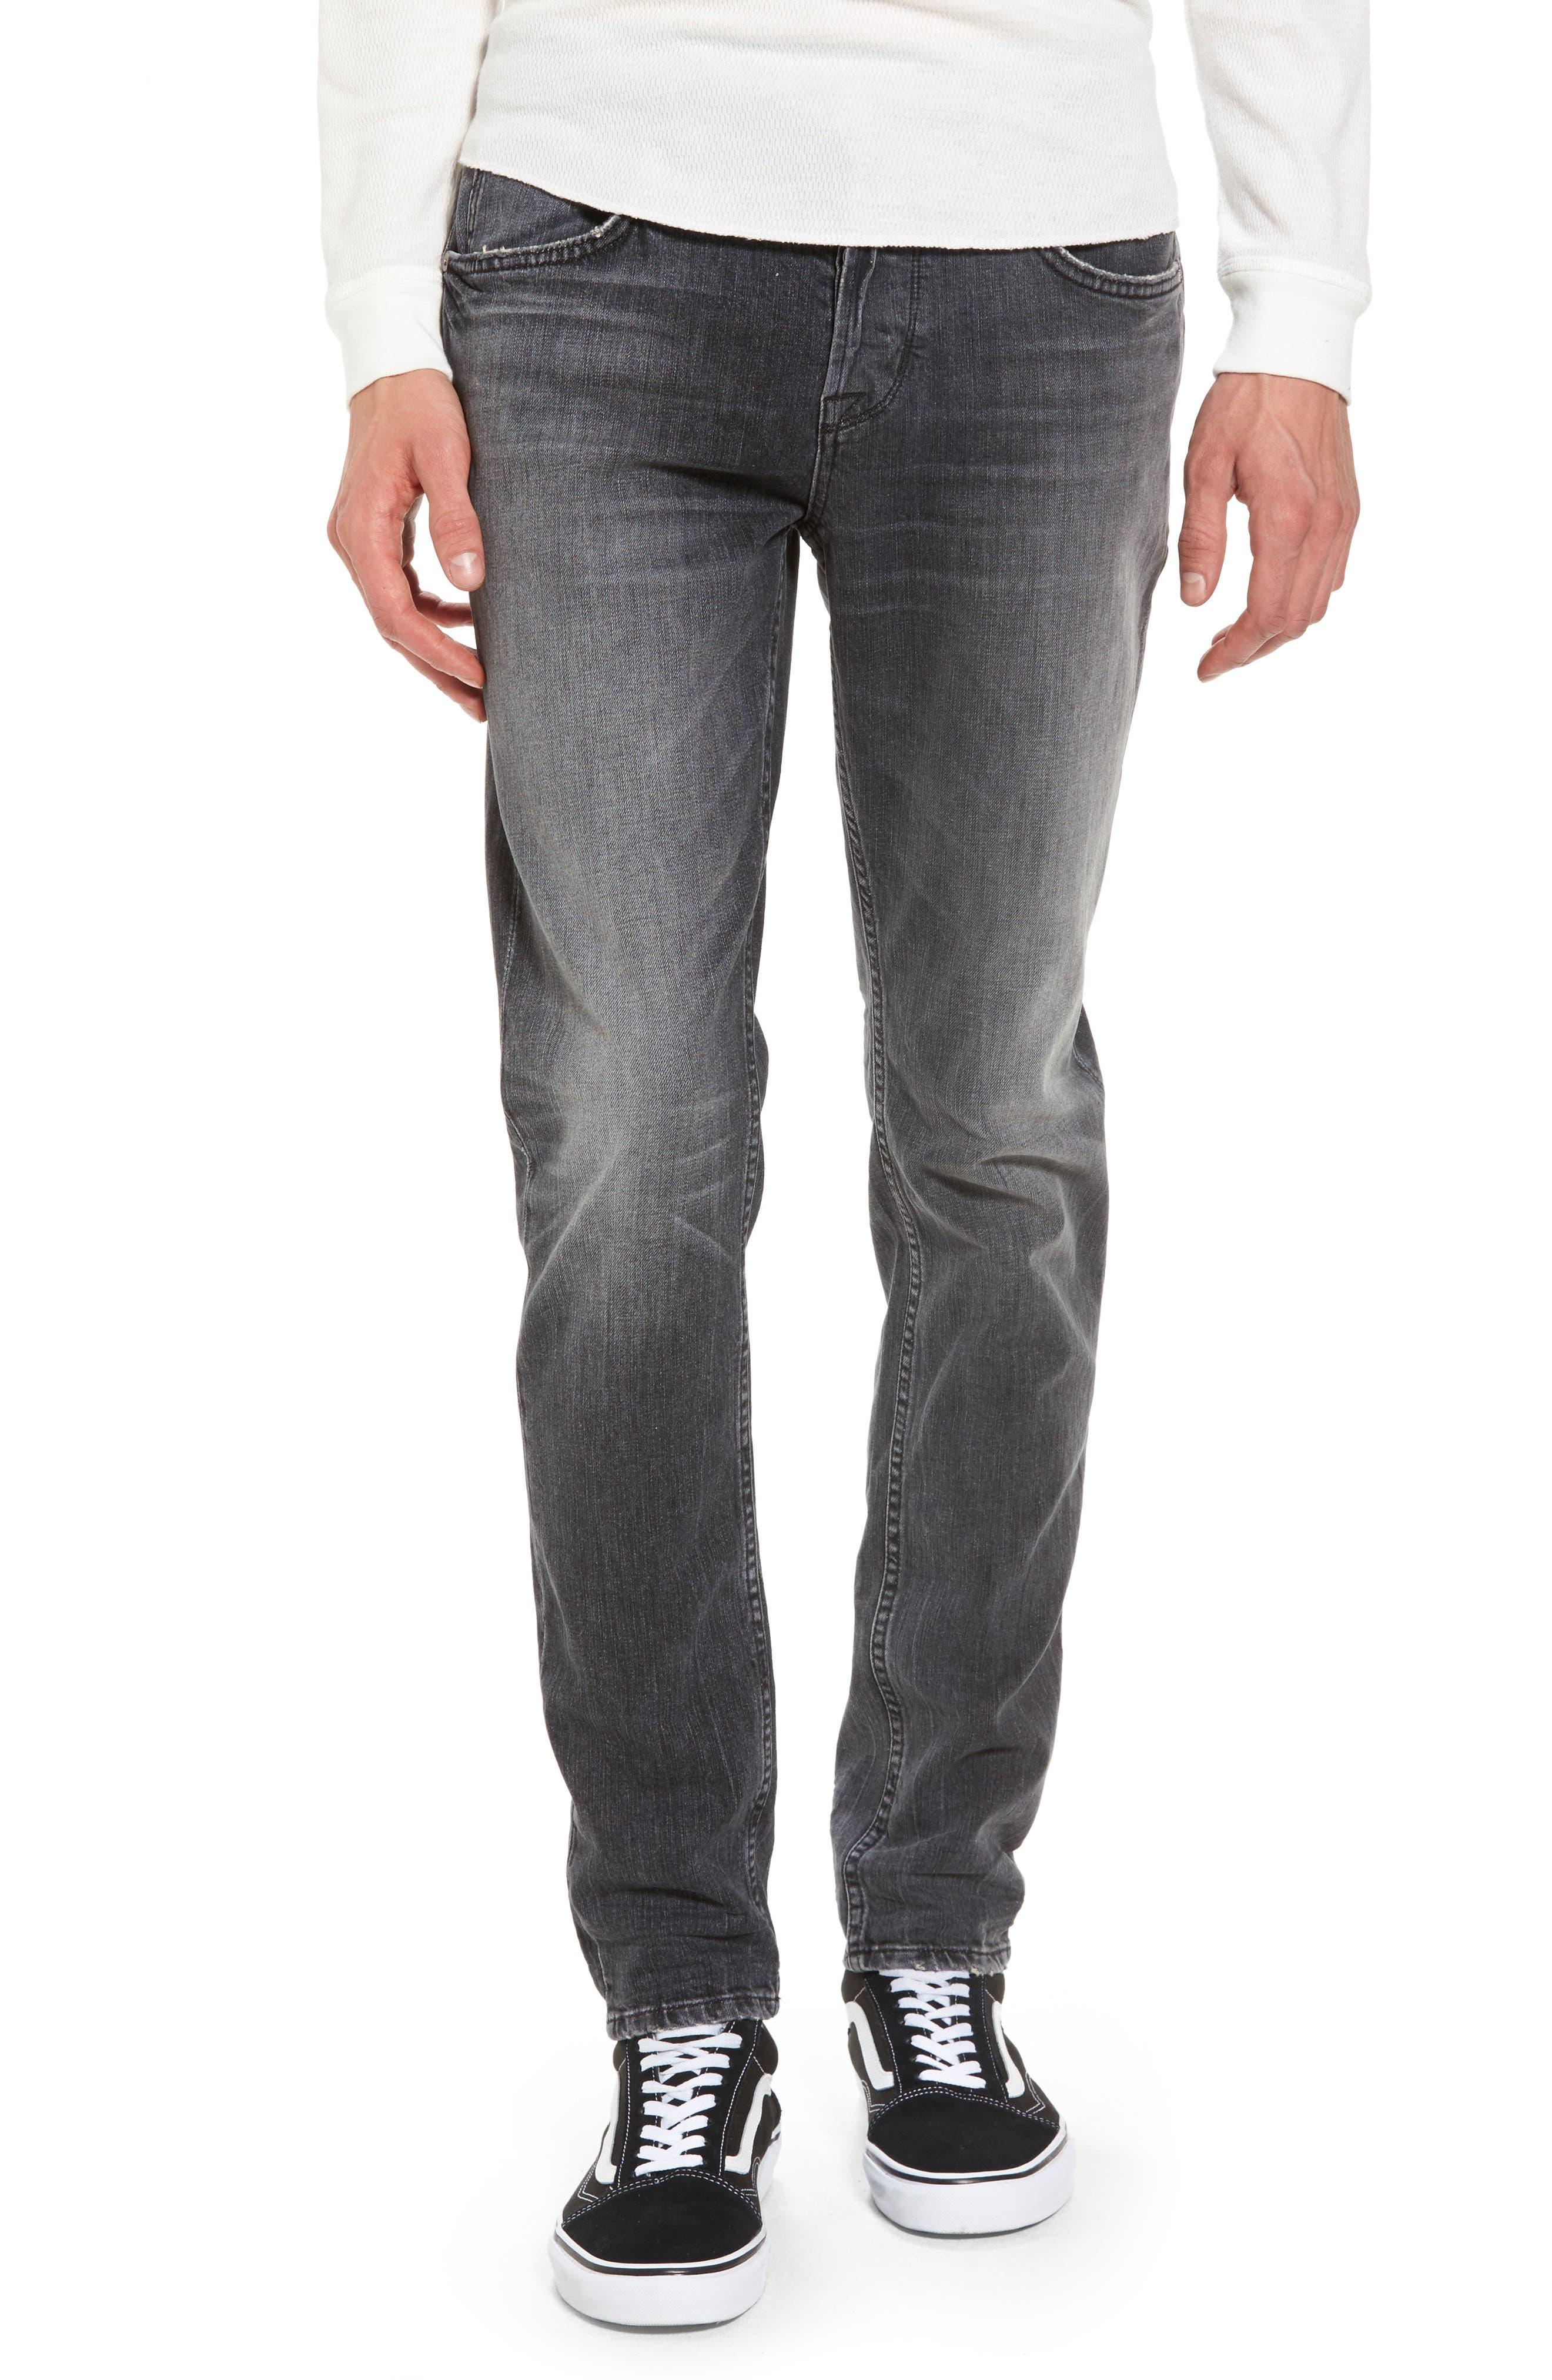 Axl Skinny Fit Jeans,                         Main,                         color, Venture